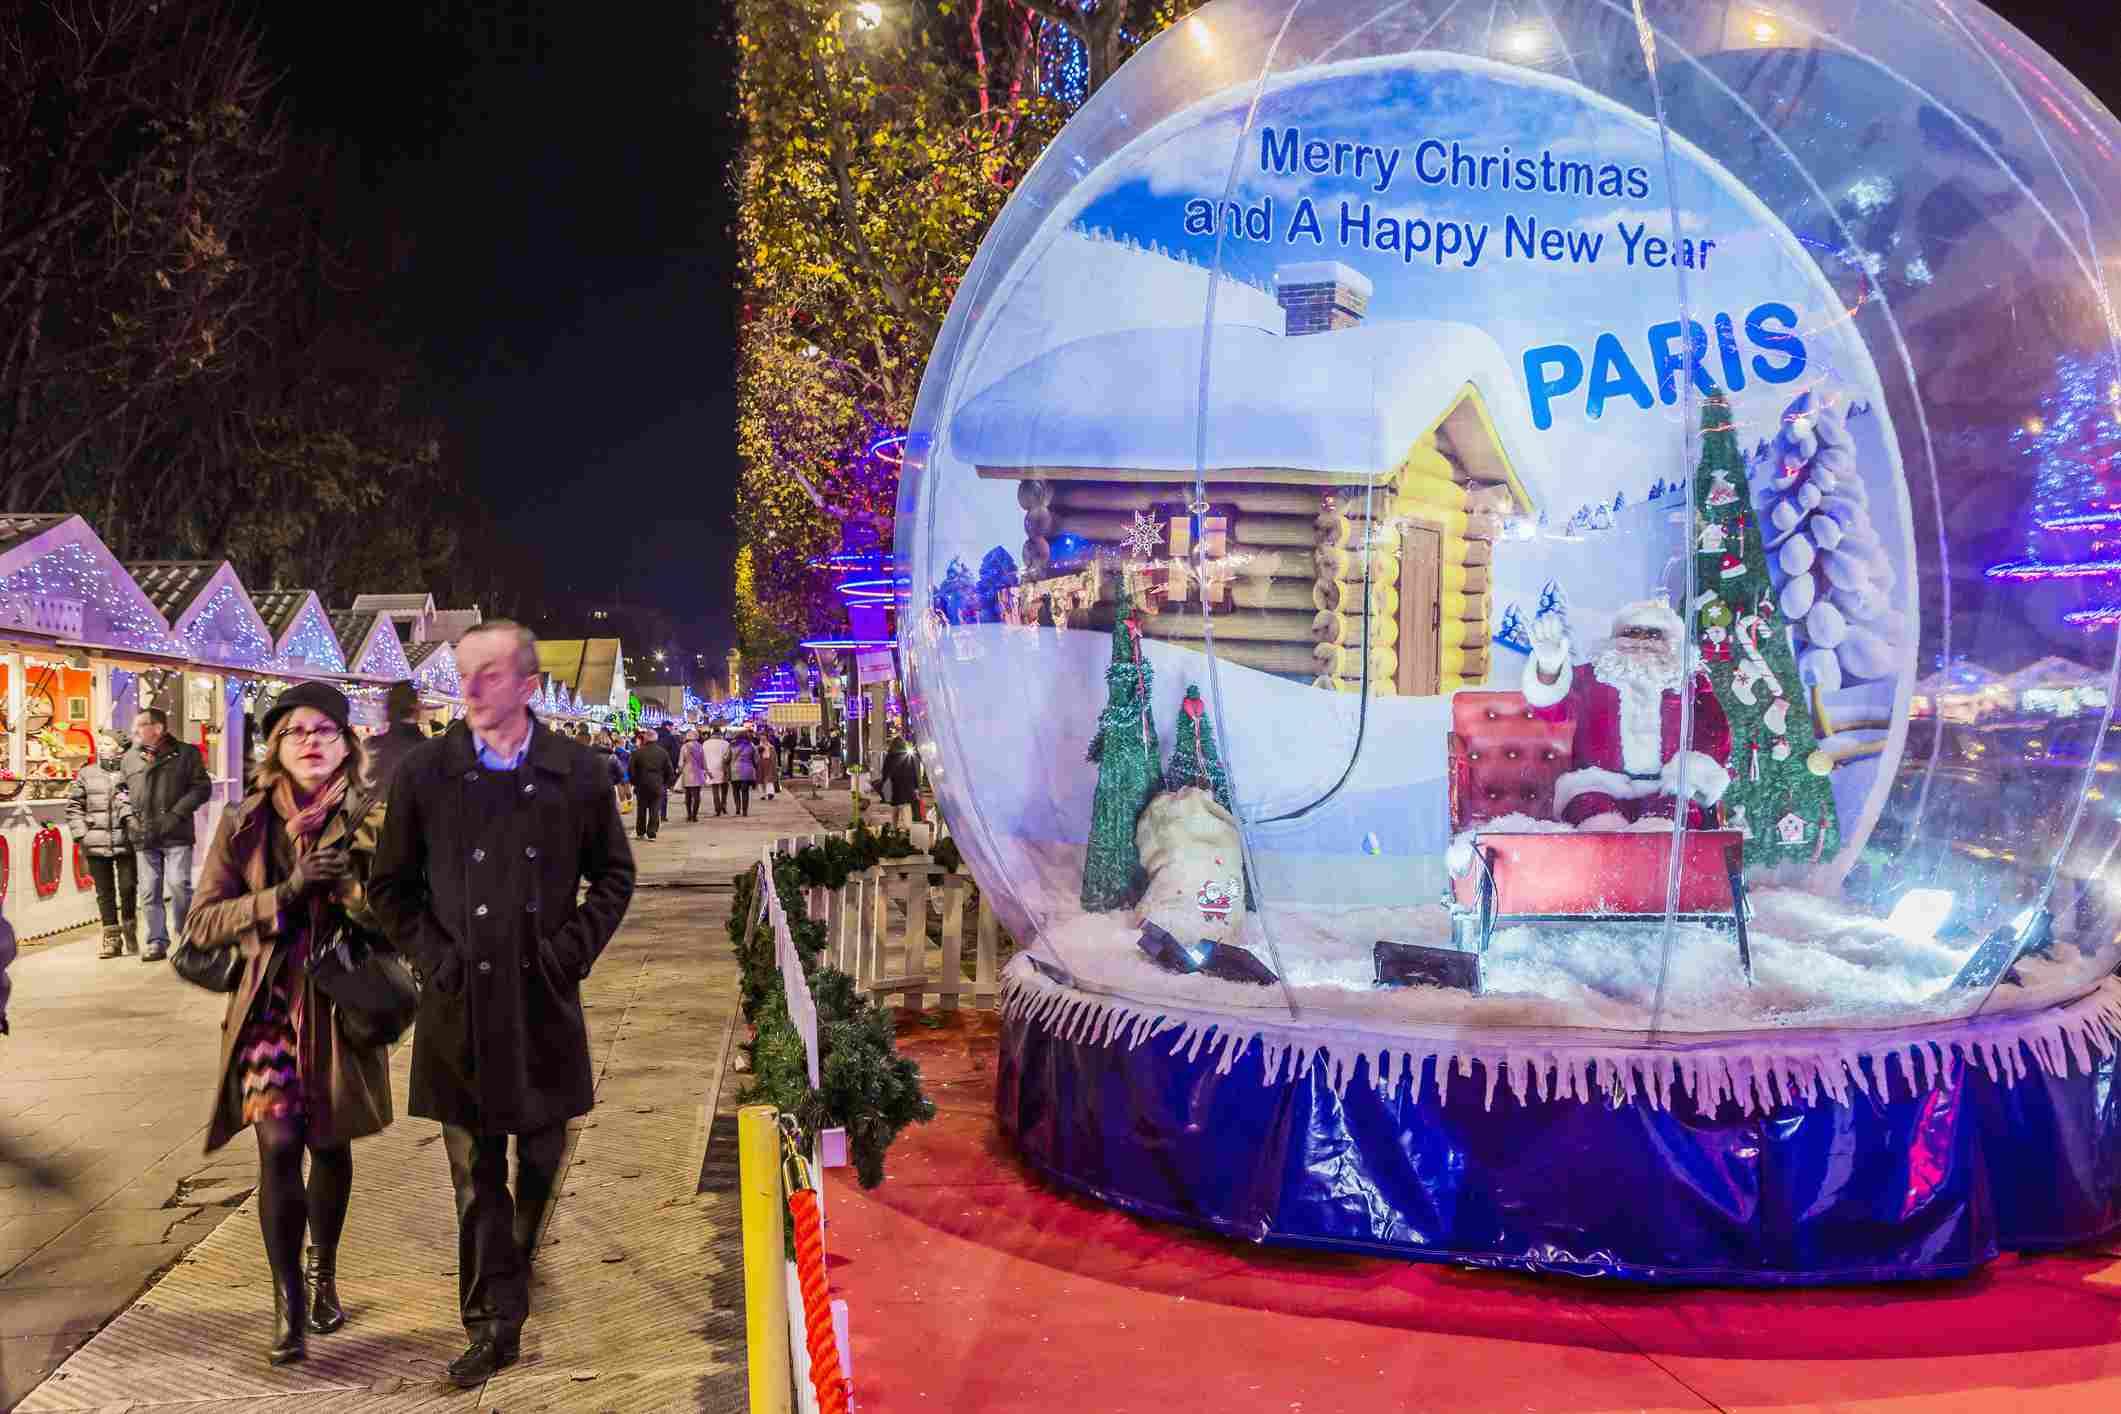 Merry Christmas from Paris (Christmas market)